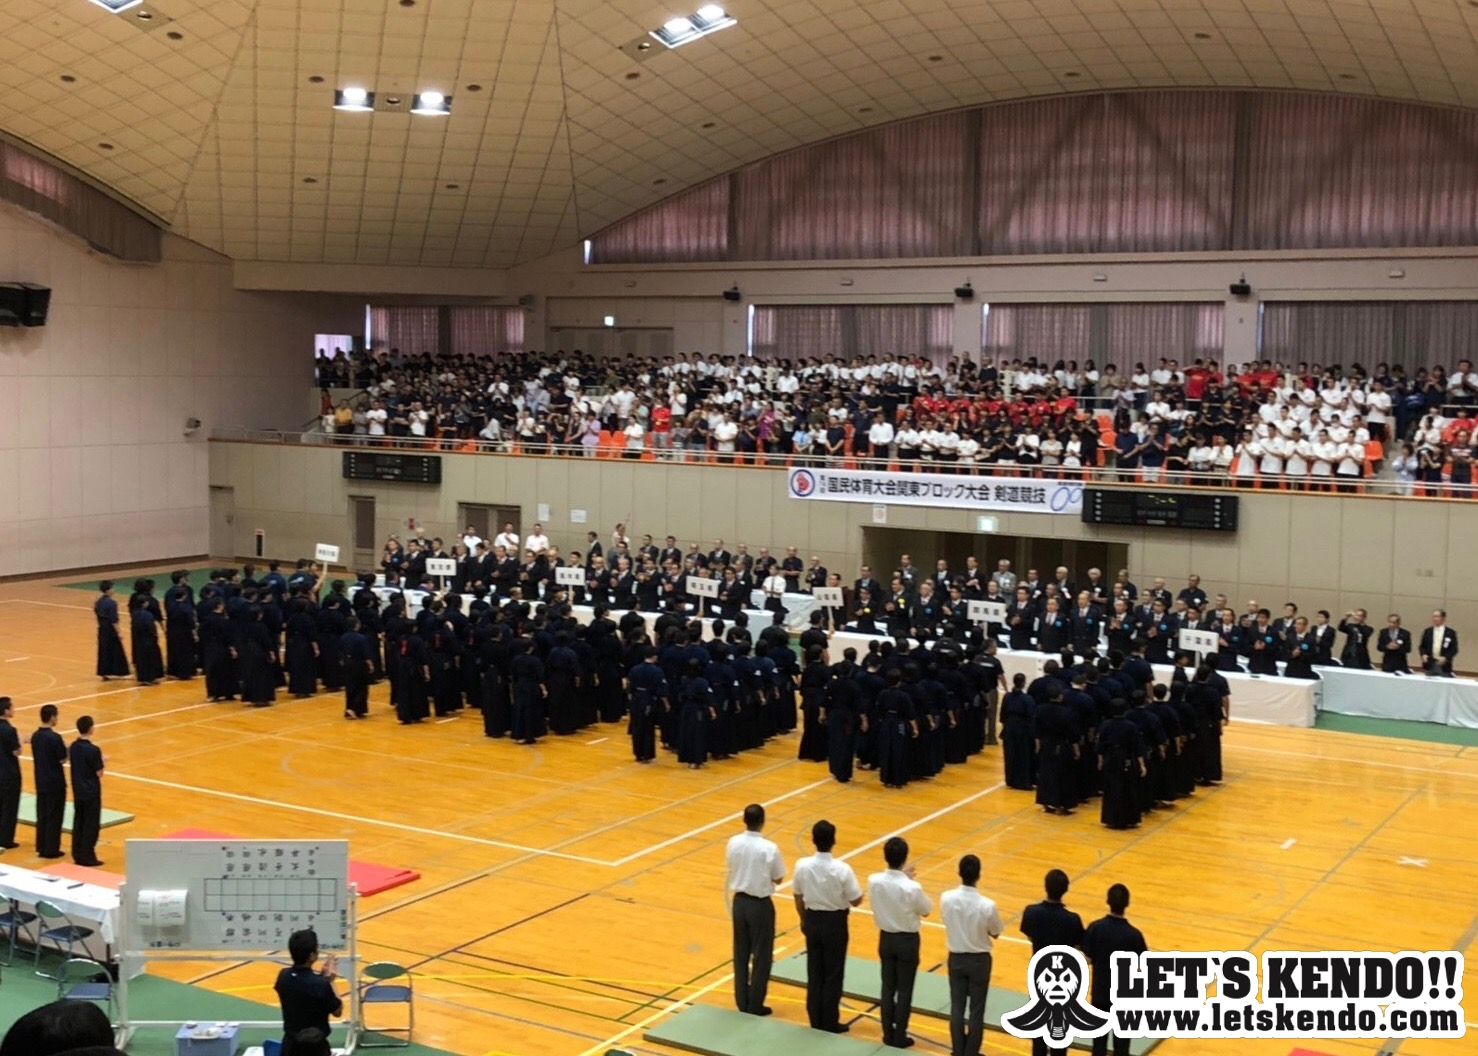 【結果】8/25 国体関東ブロック大会・剣道